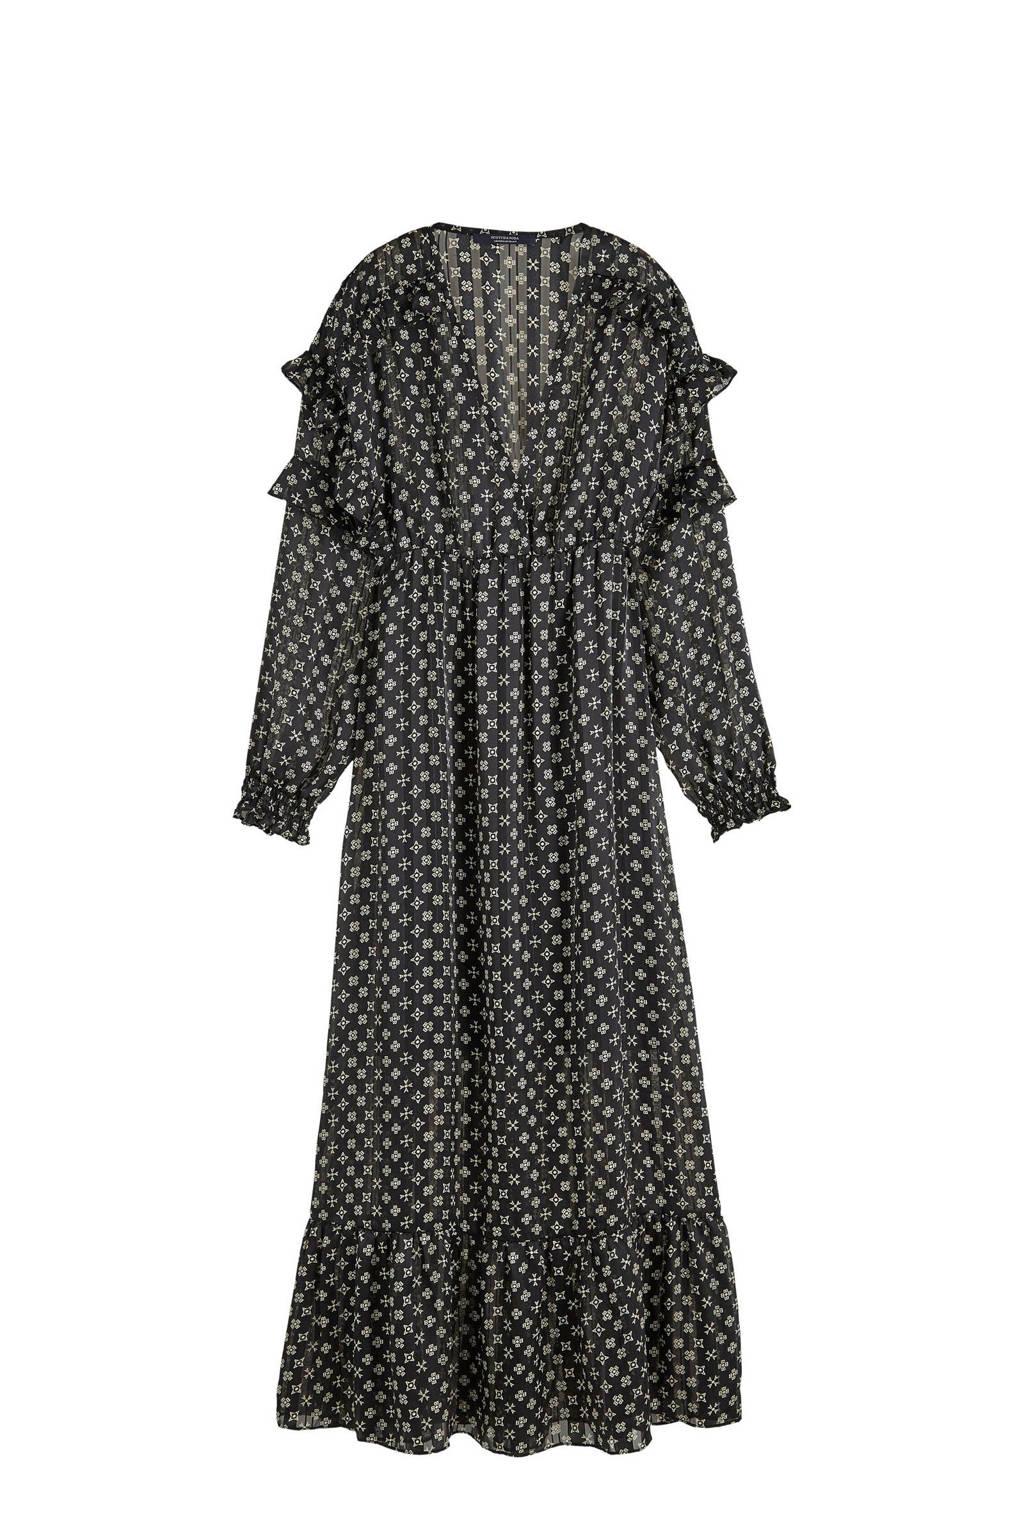 Scotch & Soda maxi jurk met all over print en volant zwart/wit, Zwart/wit